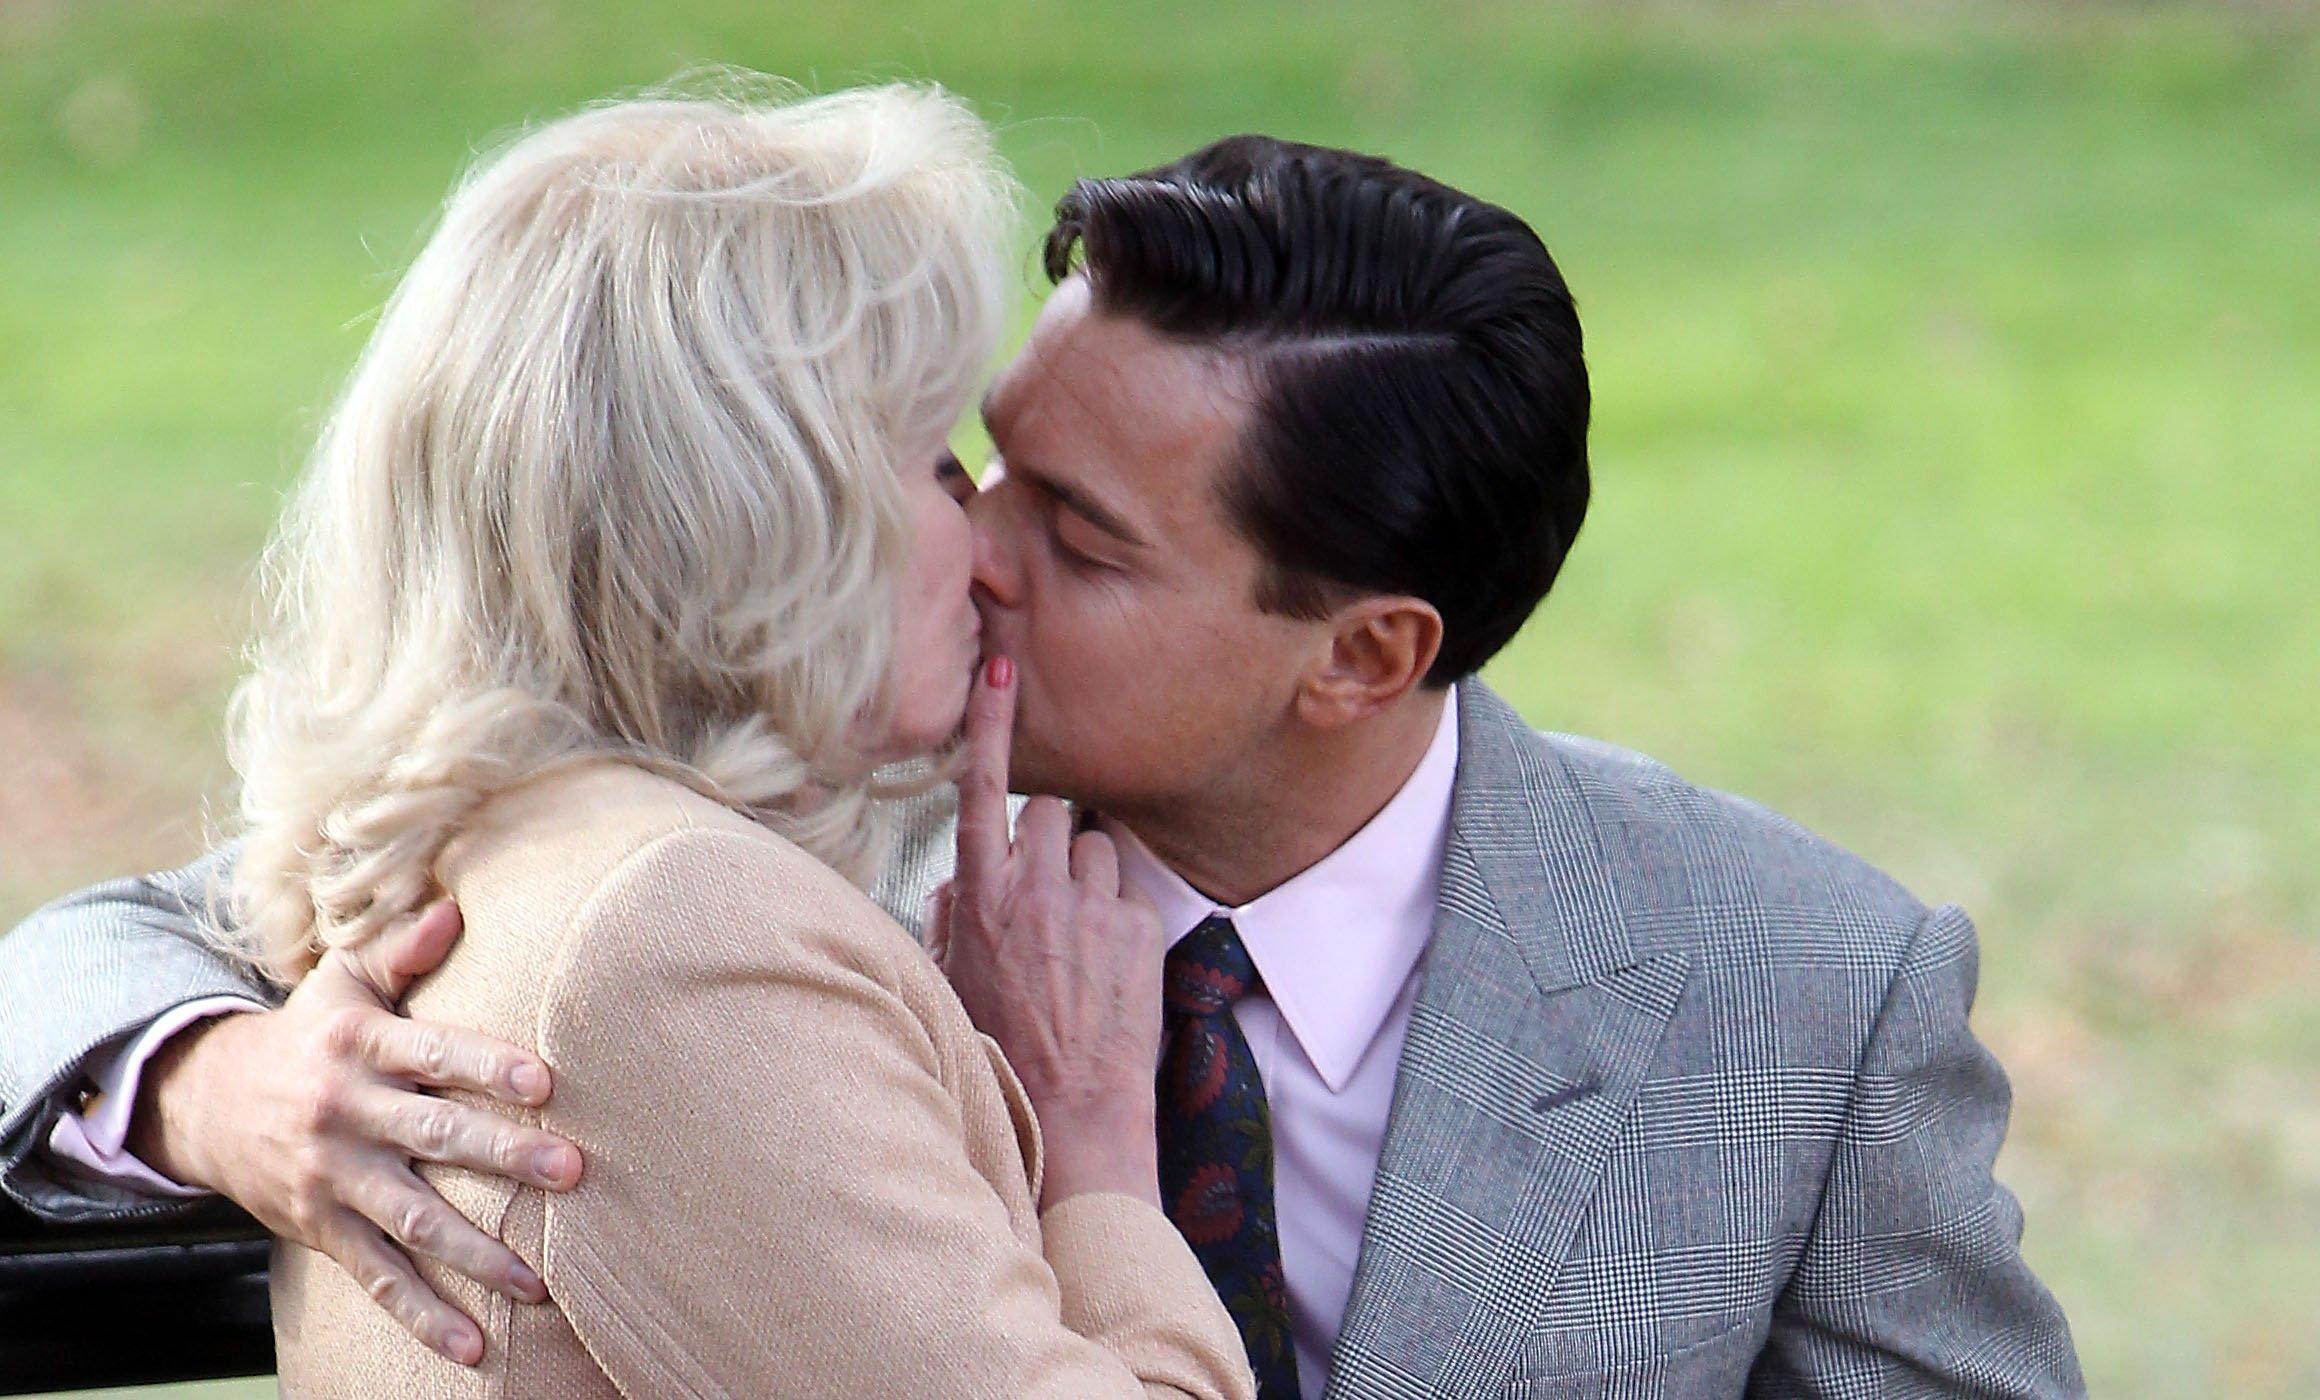 Joanna Lumley didn't enjoy snogging Wolf Of Wall Street co-star Leonardo DiCaprio: 'It's actually no fun kissing actors'